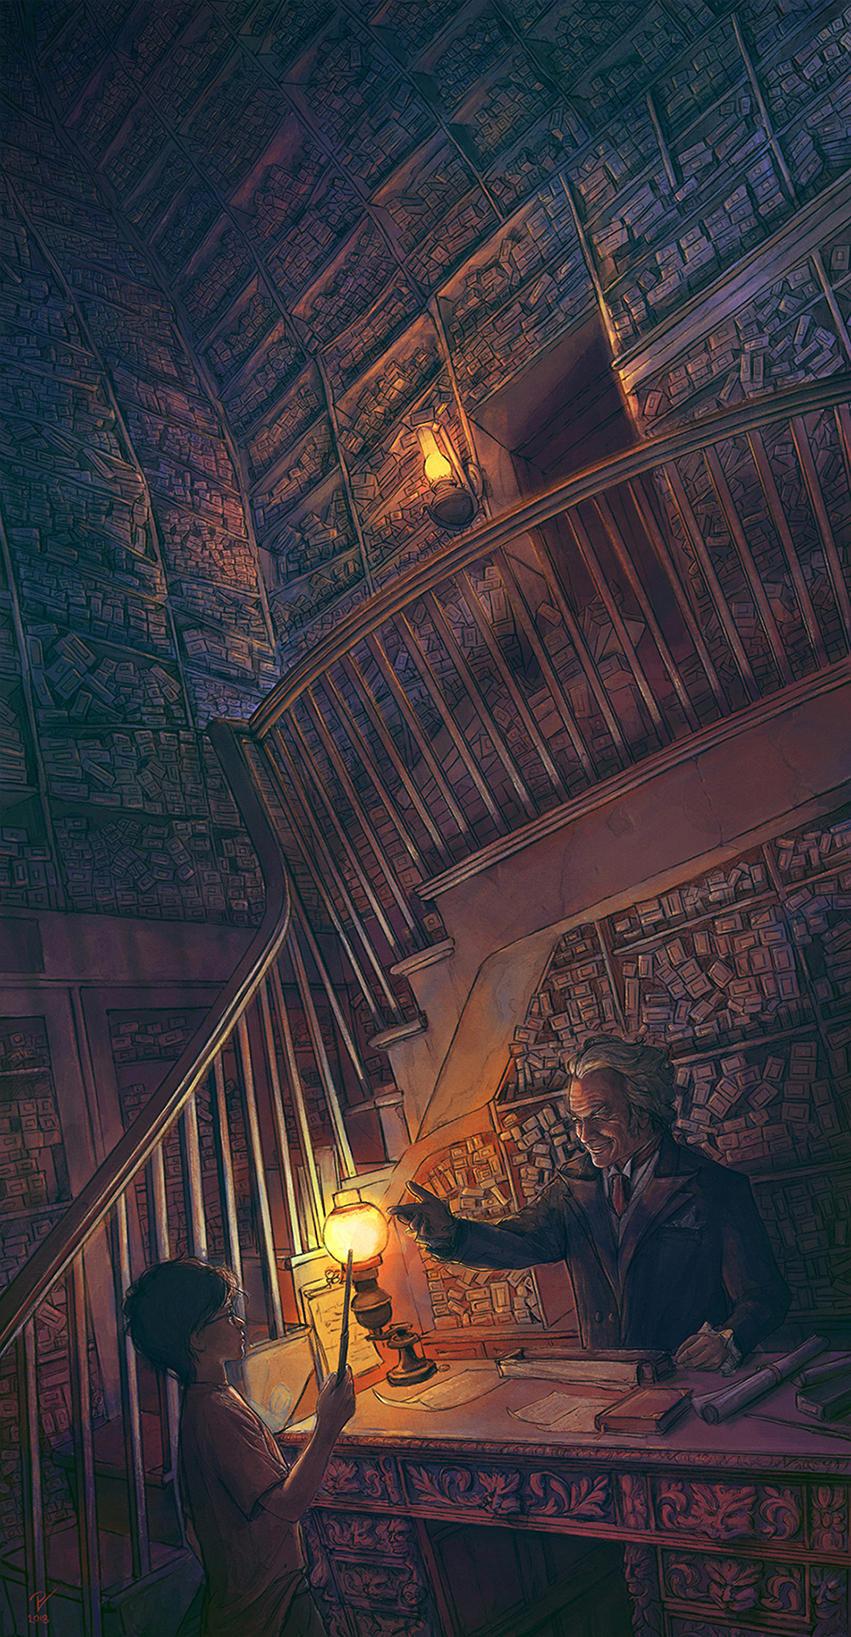 Harry Potter and the Philosopher's Stone-FanArt-04 by VladislavPANtic